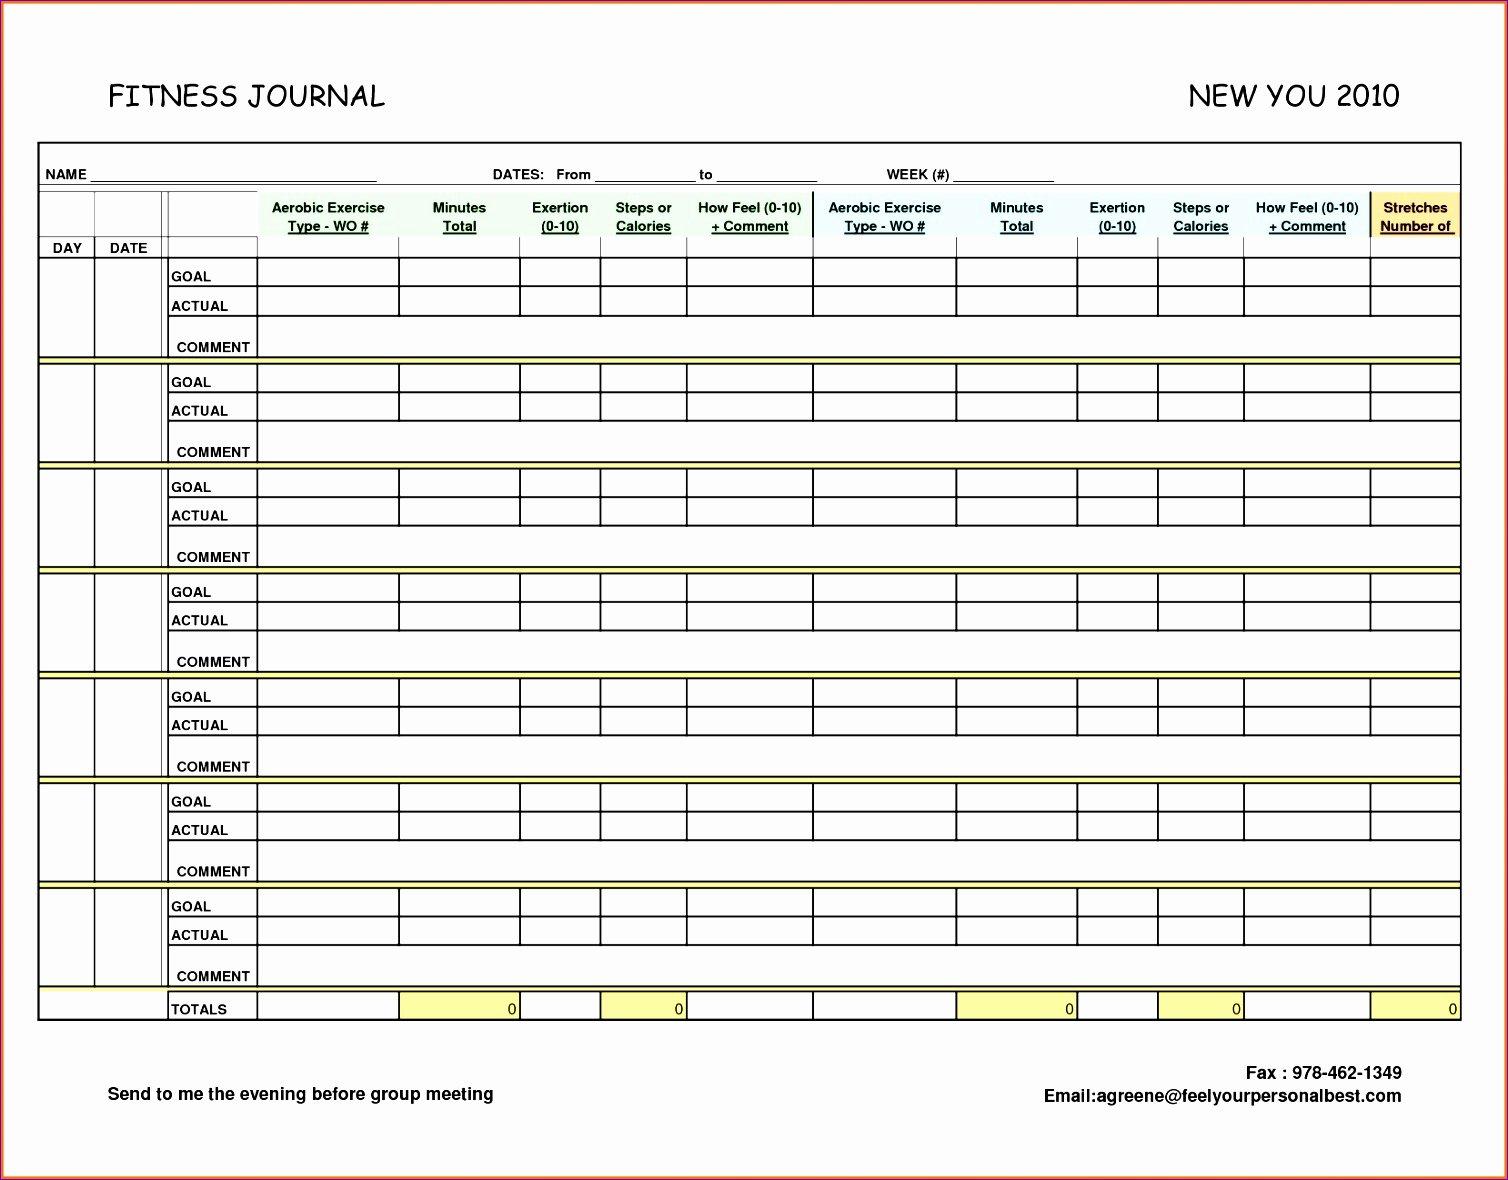 Excel 2010 Calendar Template Best Of 10 Excel 2010 Calendar Template Exceltemplates